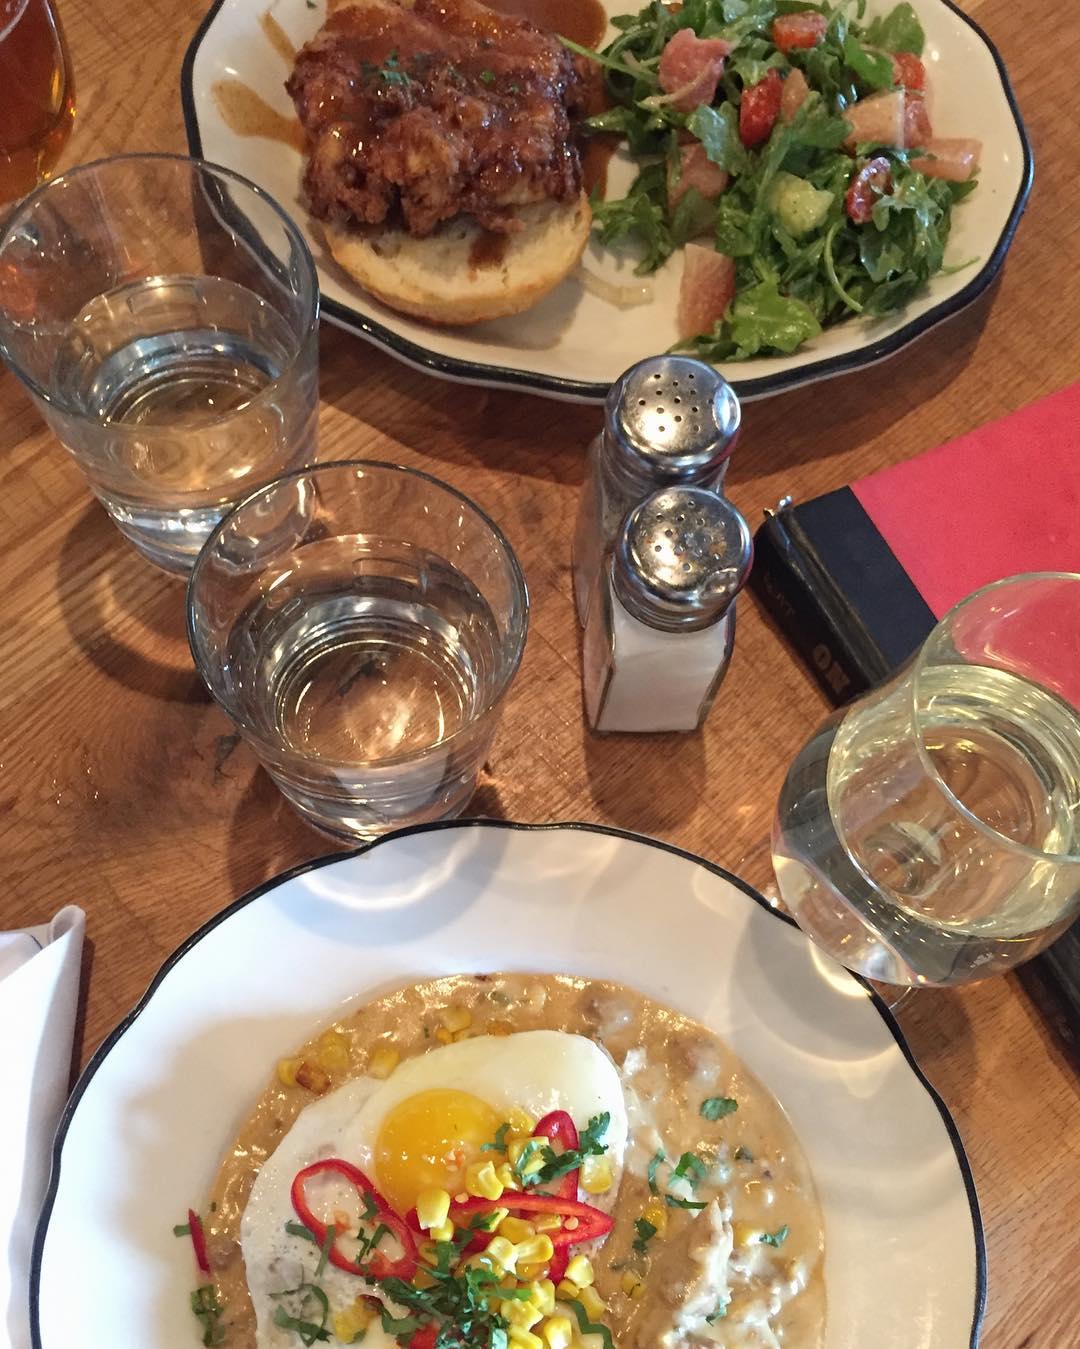 101 Beer Kitchen: Visual Menu/Reviews by Food Bloggers/Instagrammers